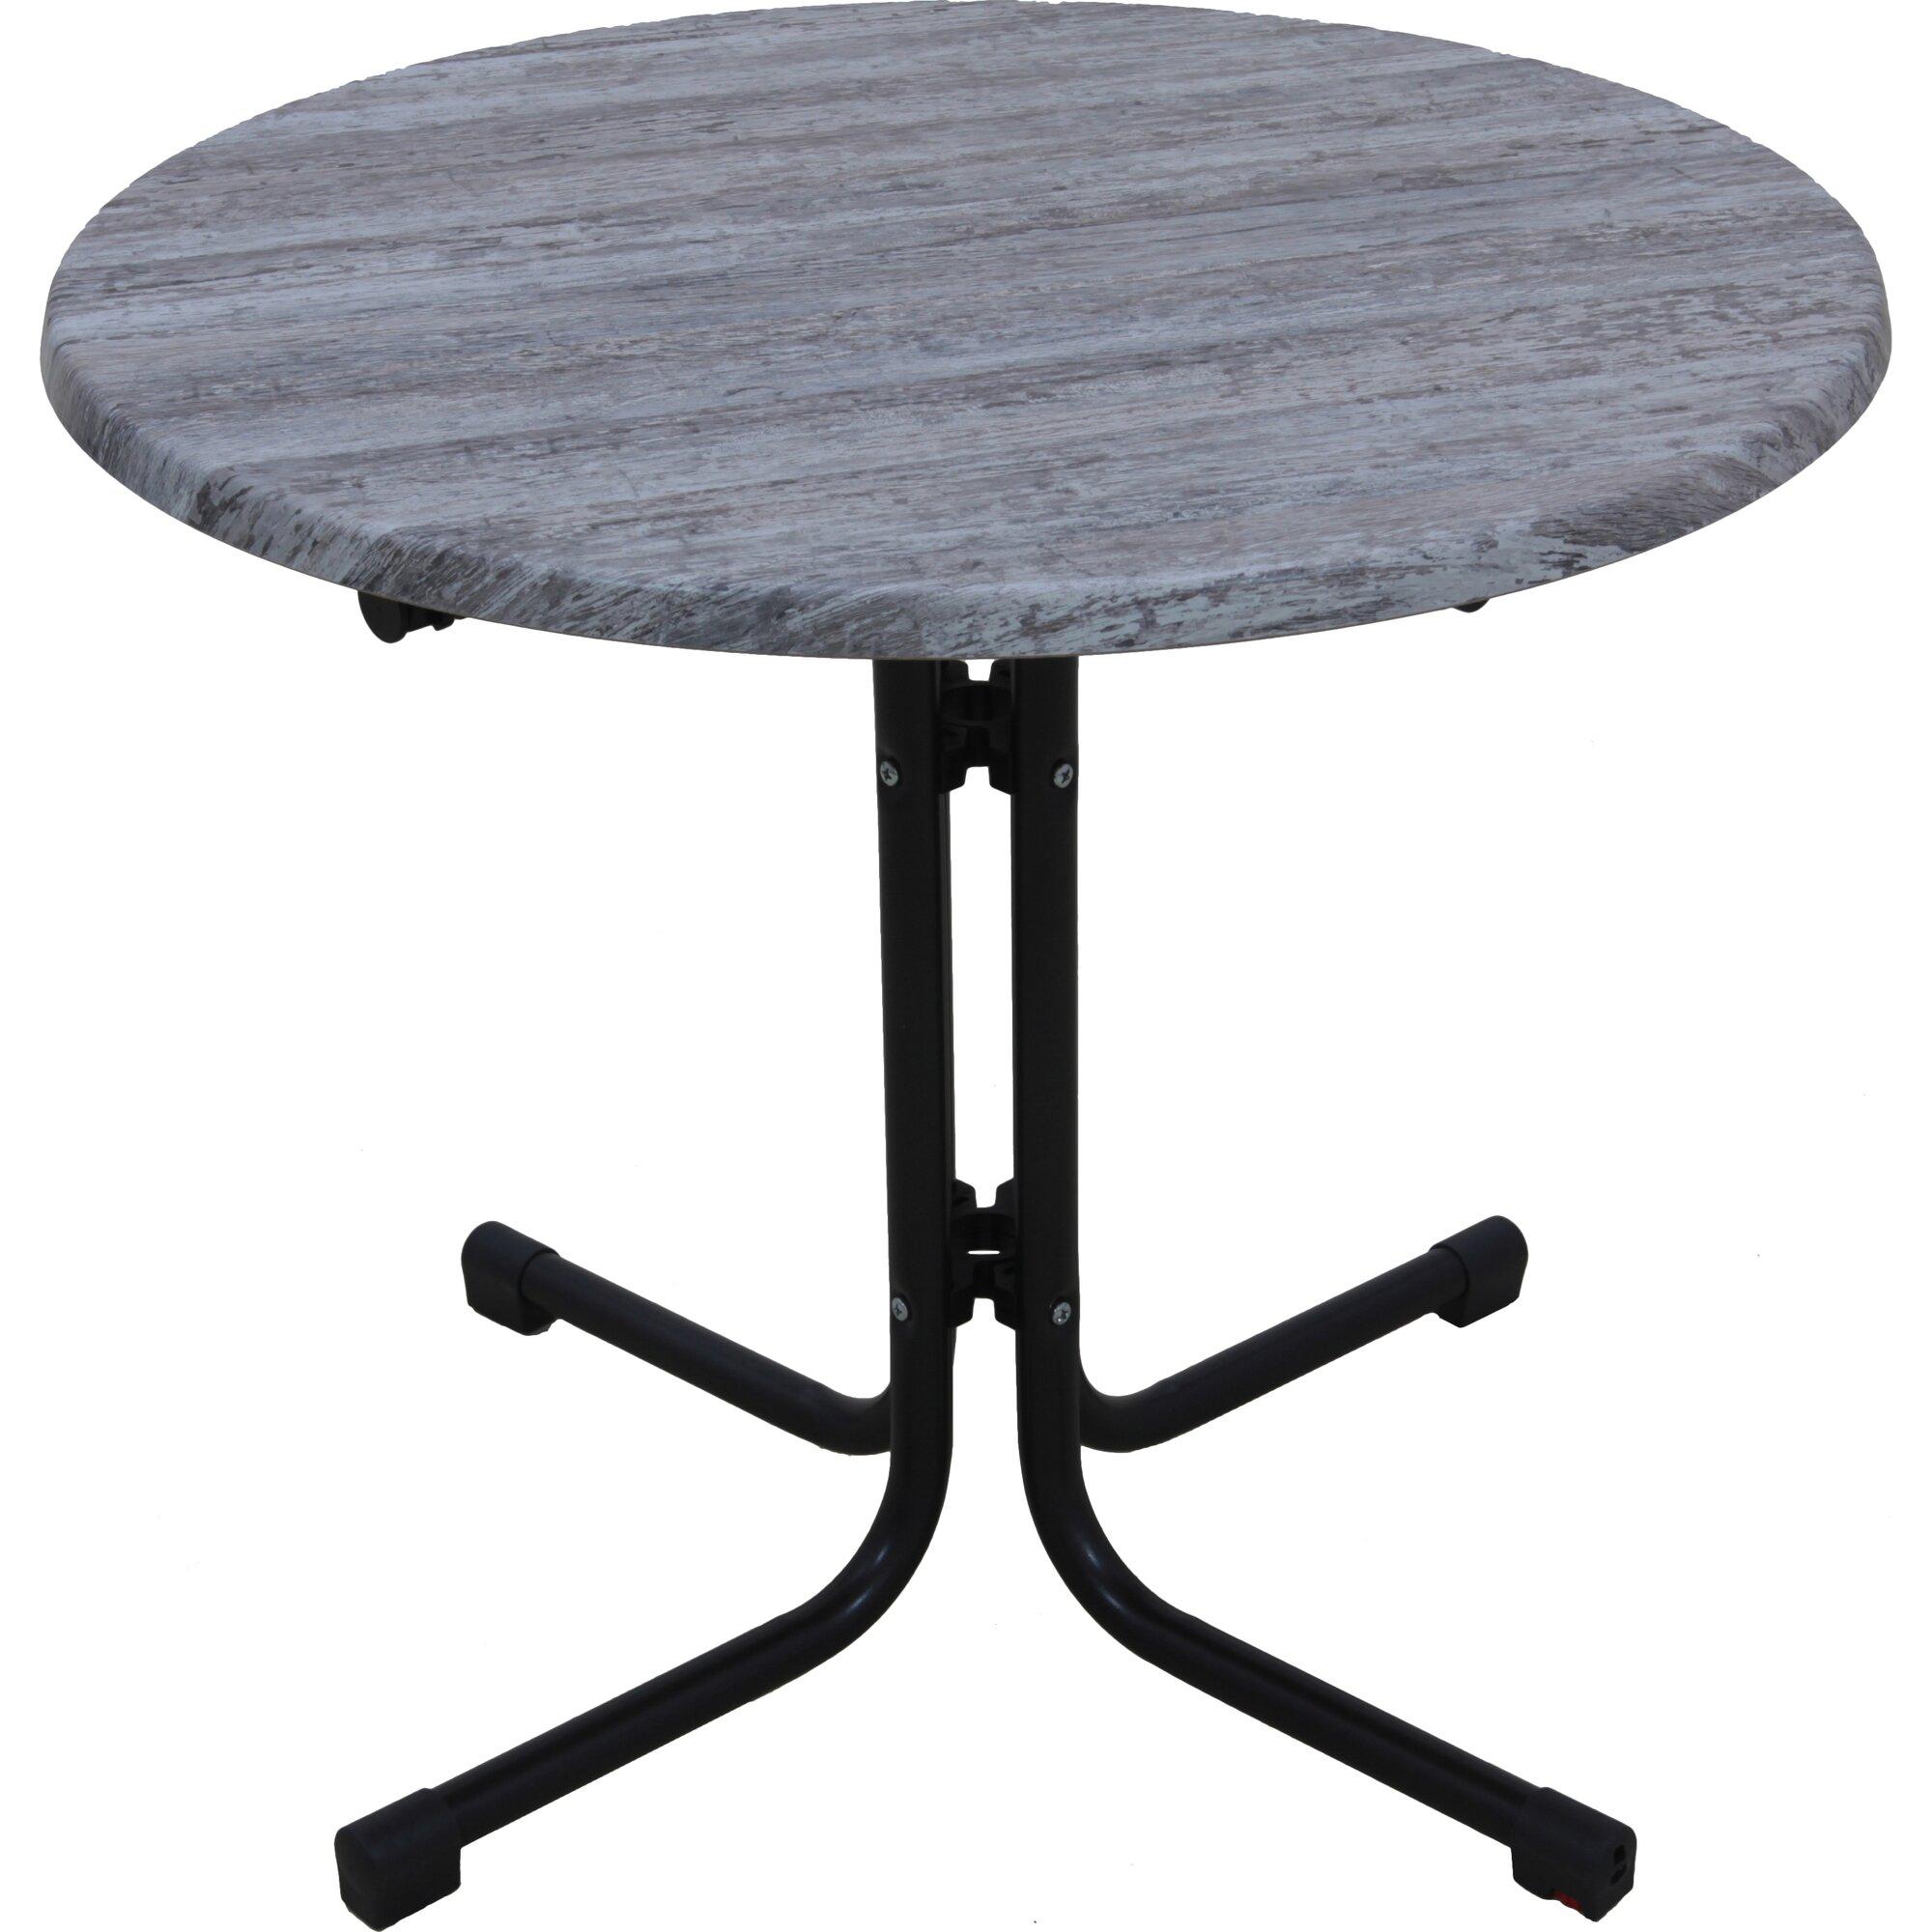 Fritz Mueller Luitgard Folding Dining Table & Reviews | Wayfair.co.uk